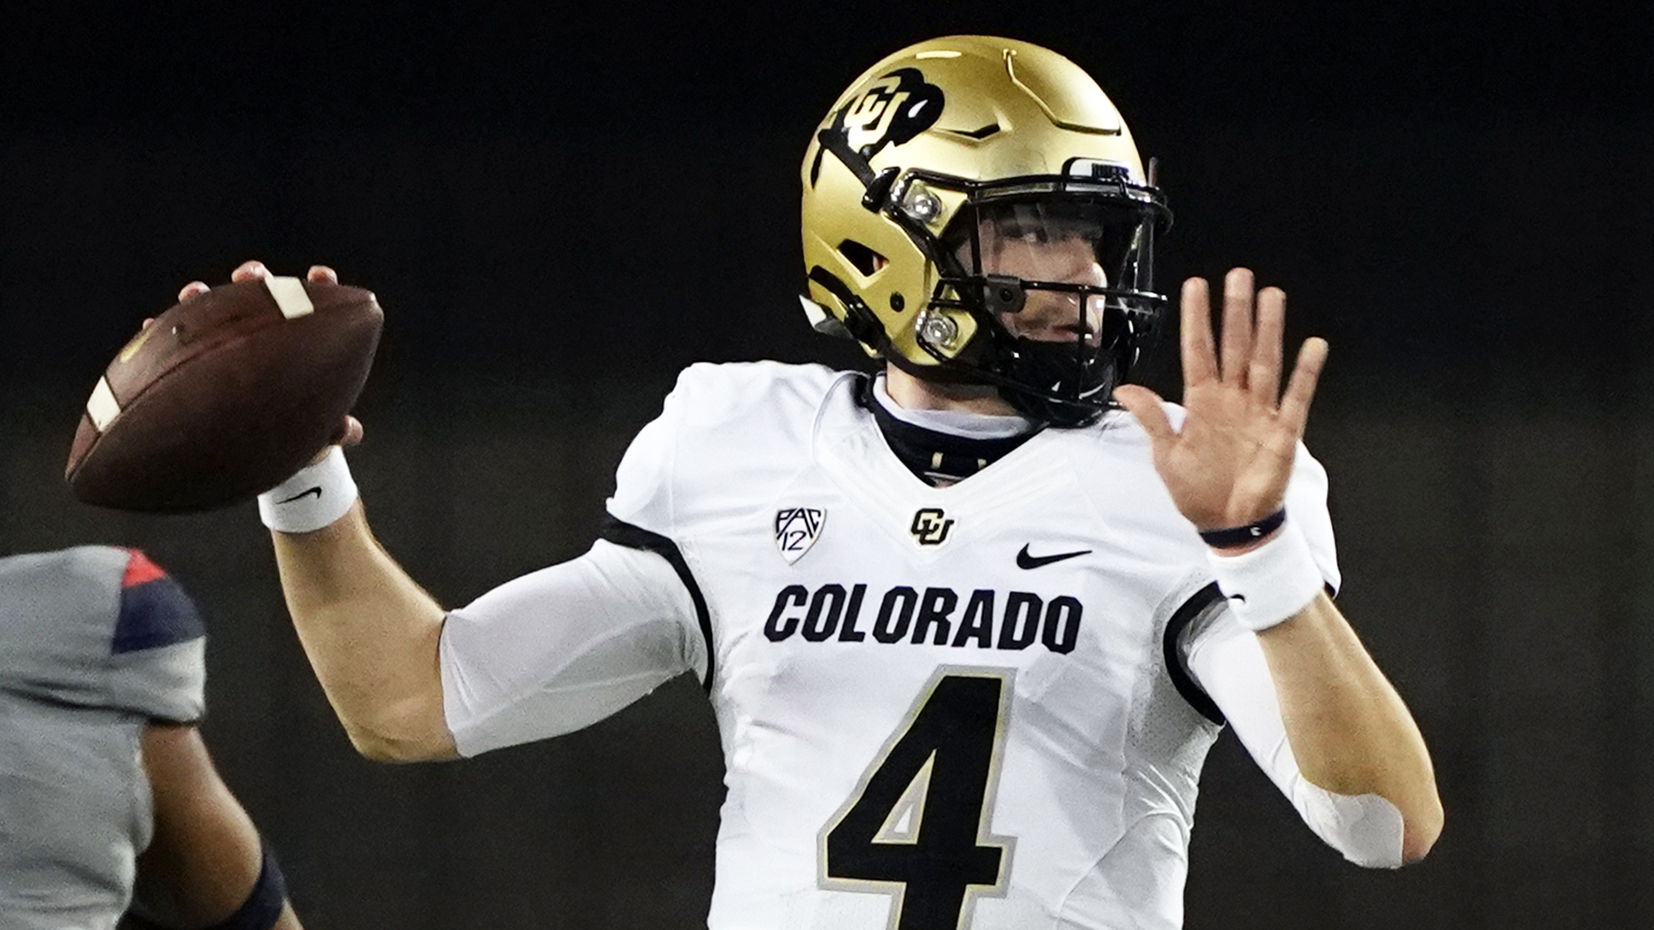 FILE - Colorado quarterback Sam Noyer (4) looks to pass against Arizona in the first half of an NCAA college football game against Arizona in Tucson, Ariz., in this Saturday, Dec. 5, 2020, file photo. (AP Photo/Rick Scuteri, File)